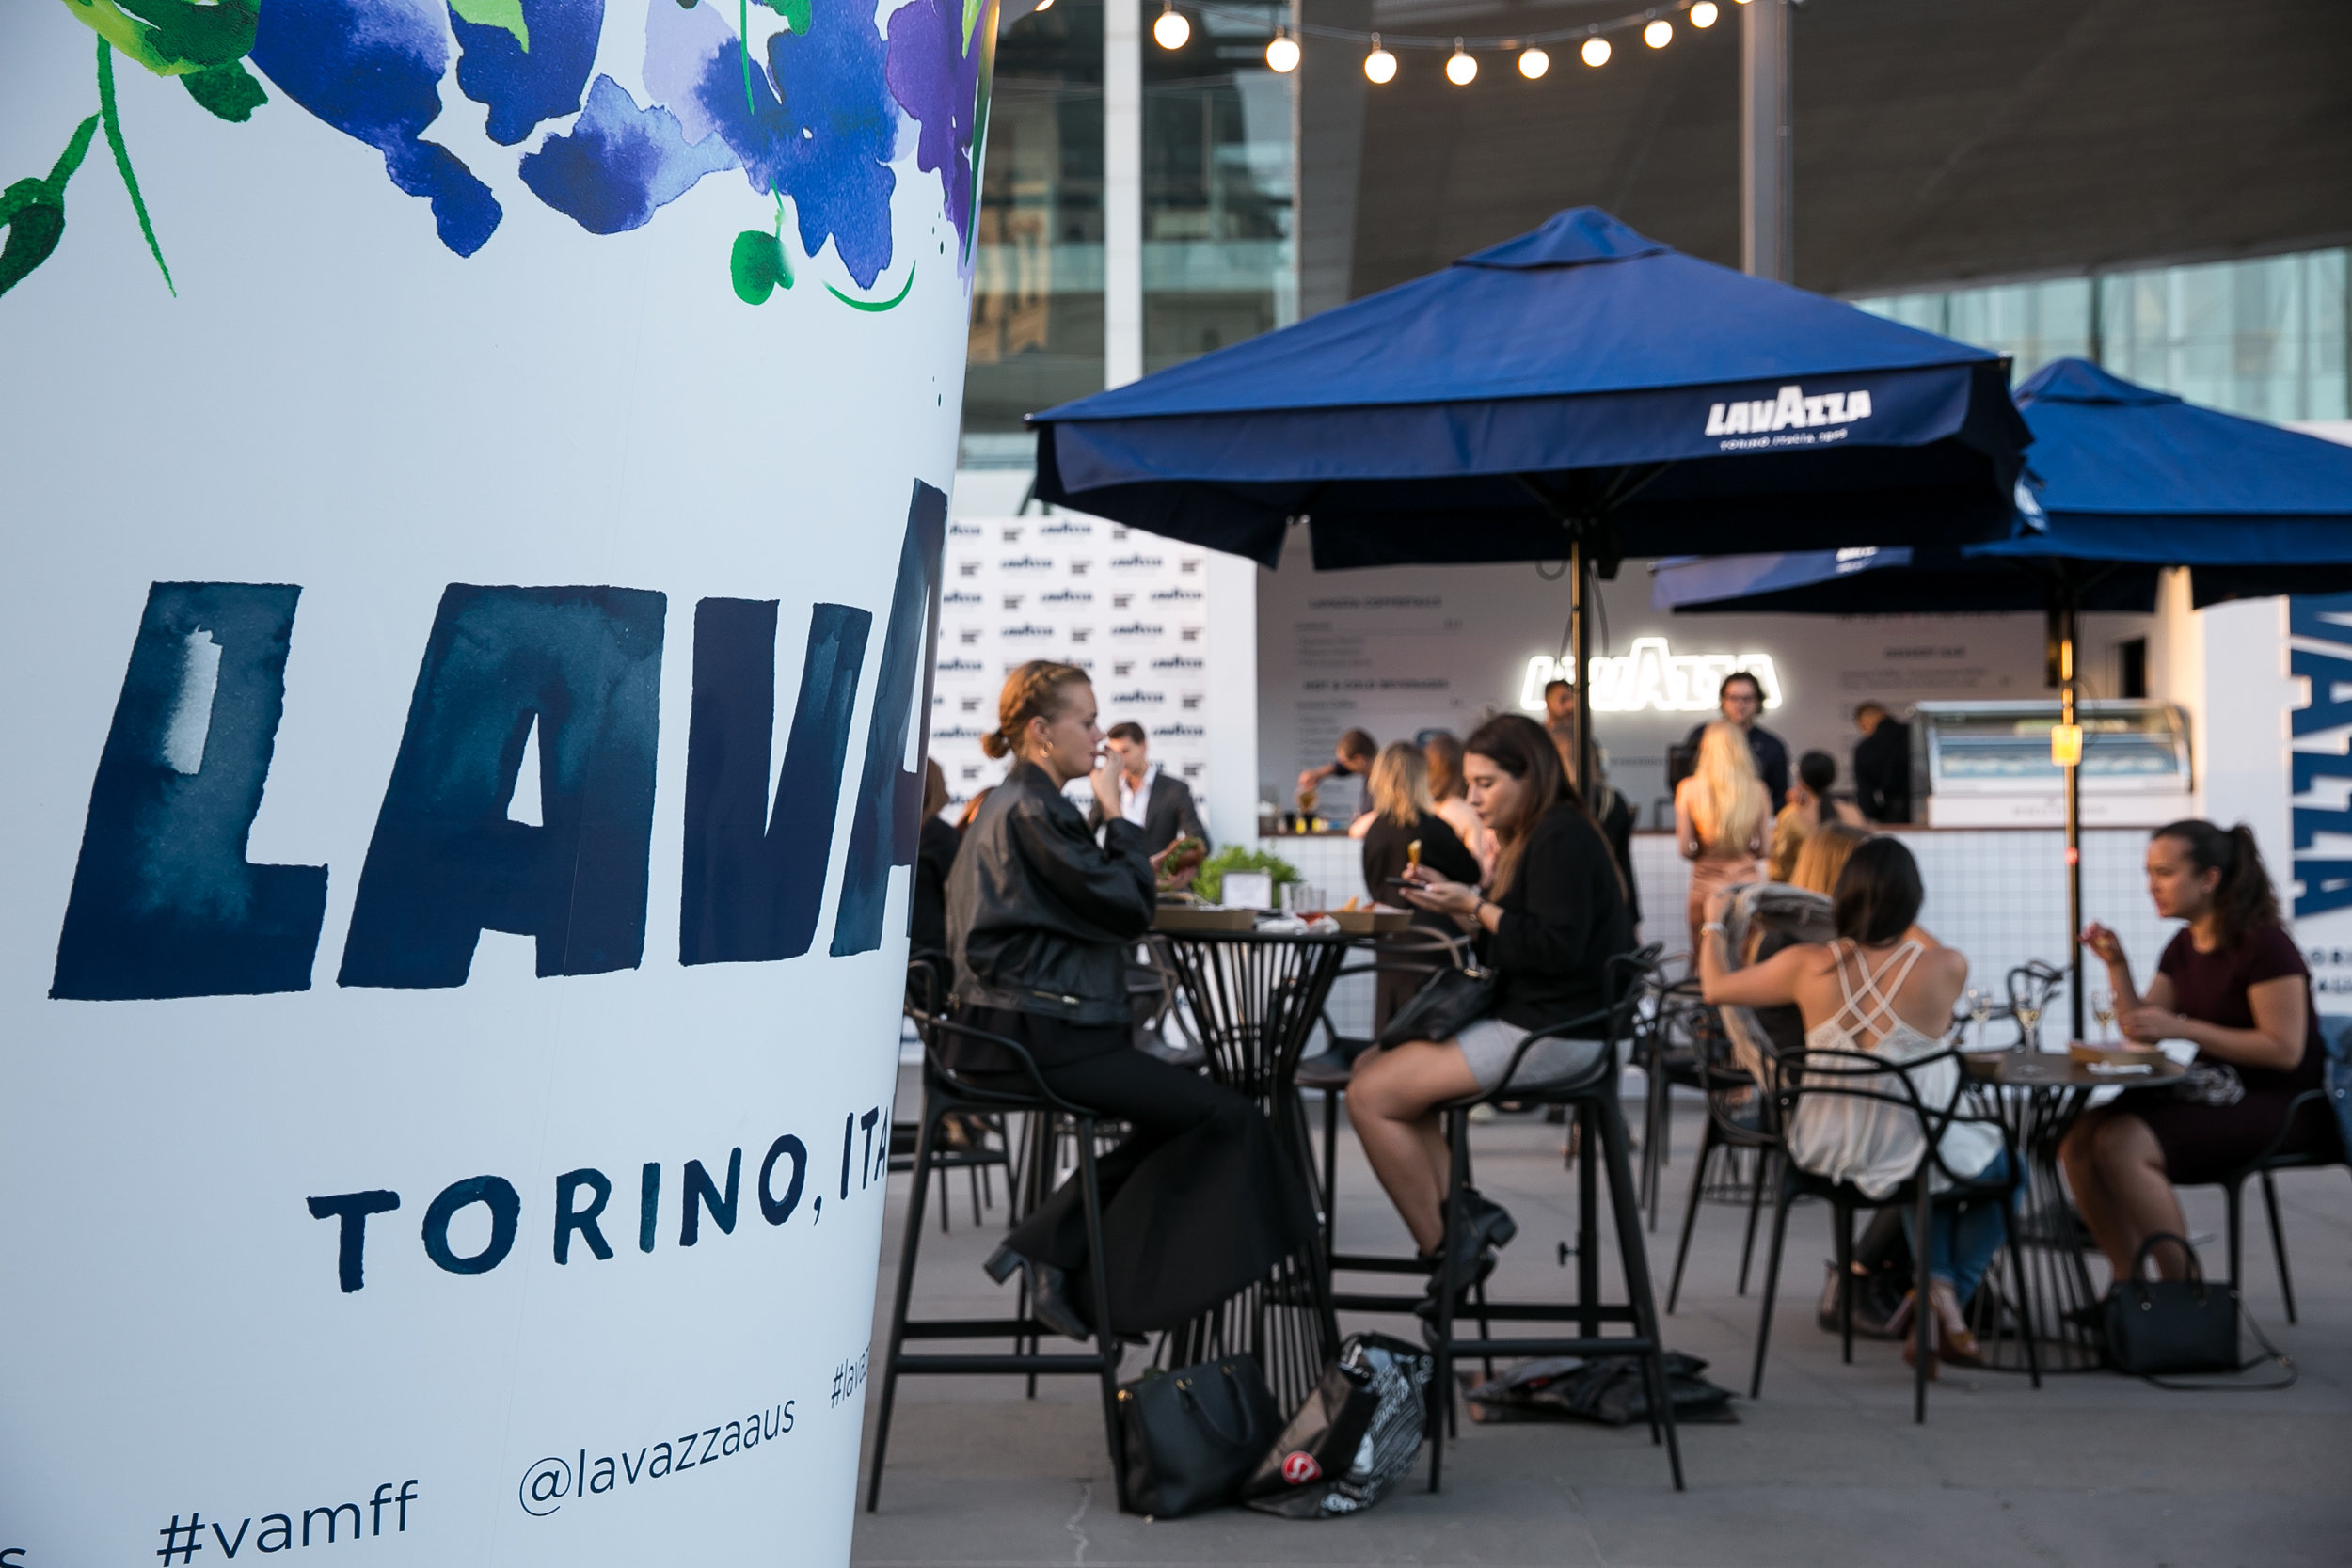 lavazza-vamff-2017-day-3-lavazza-cafe.JPG